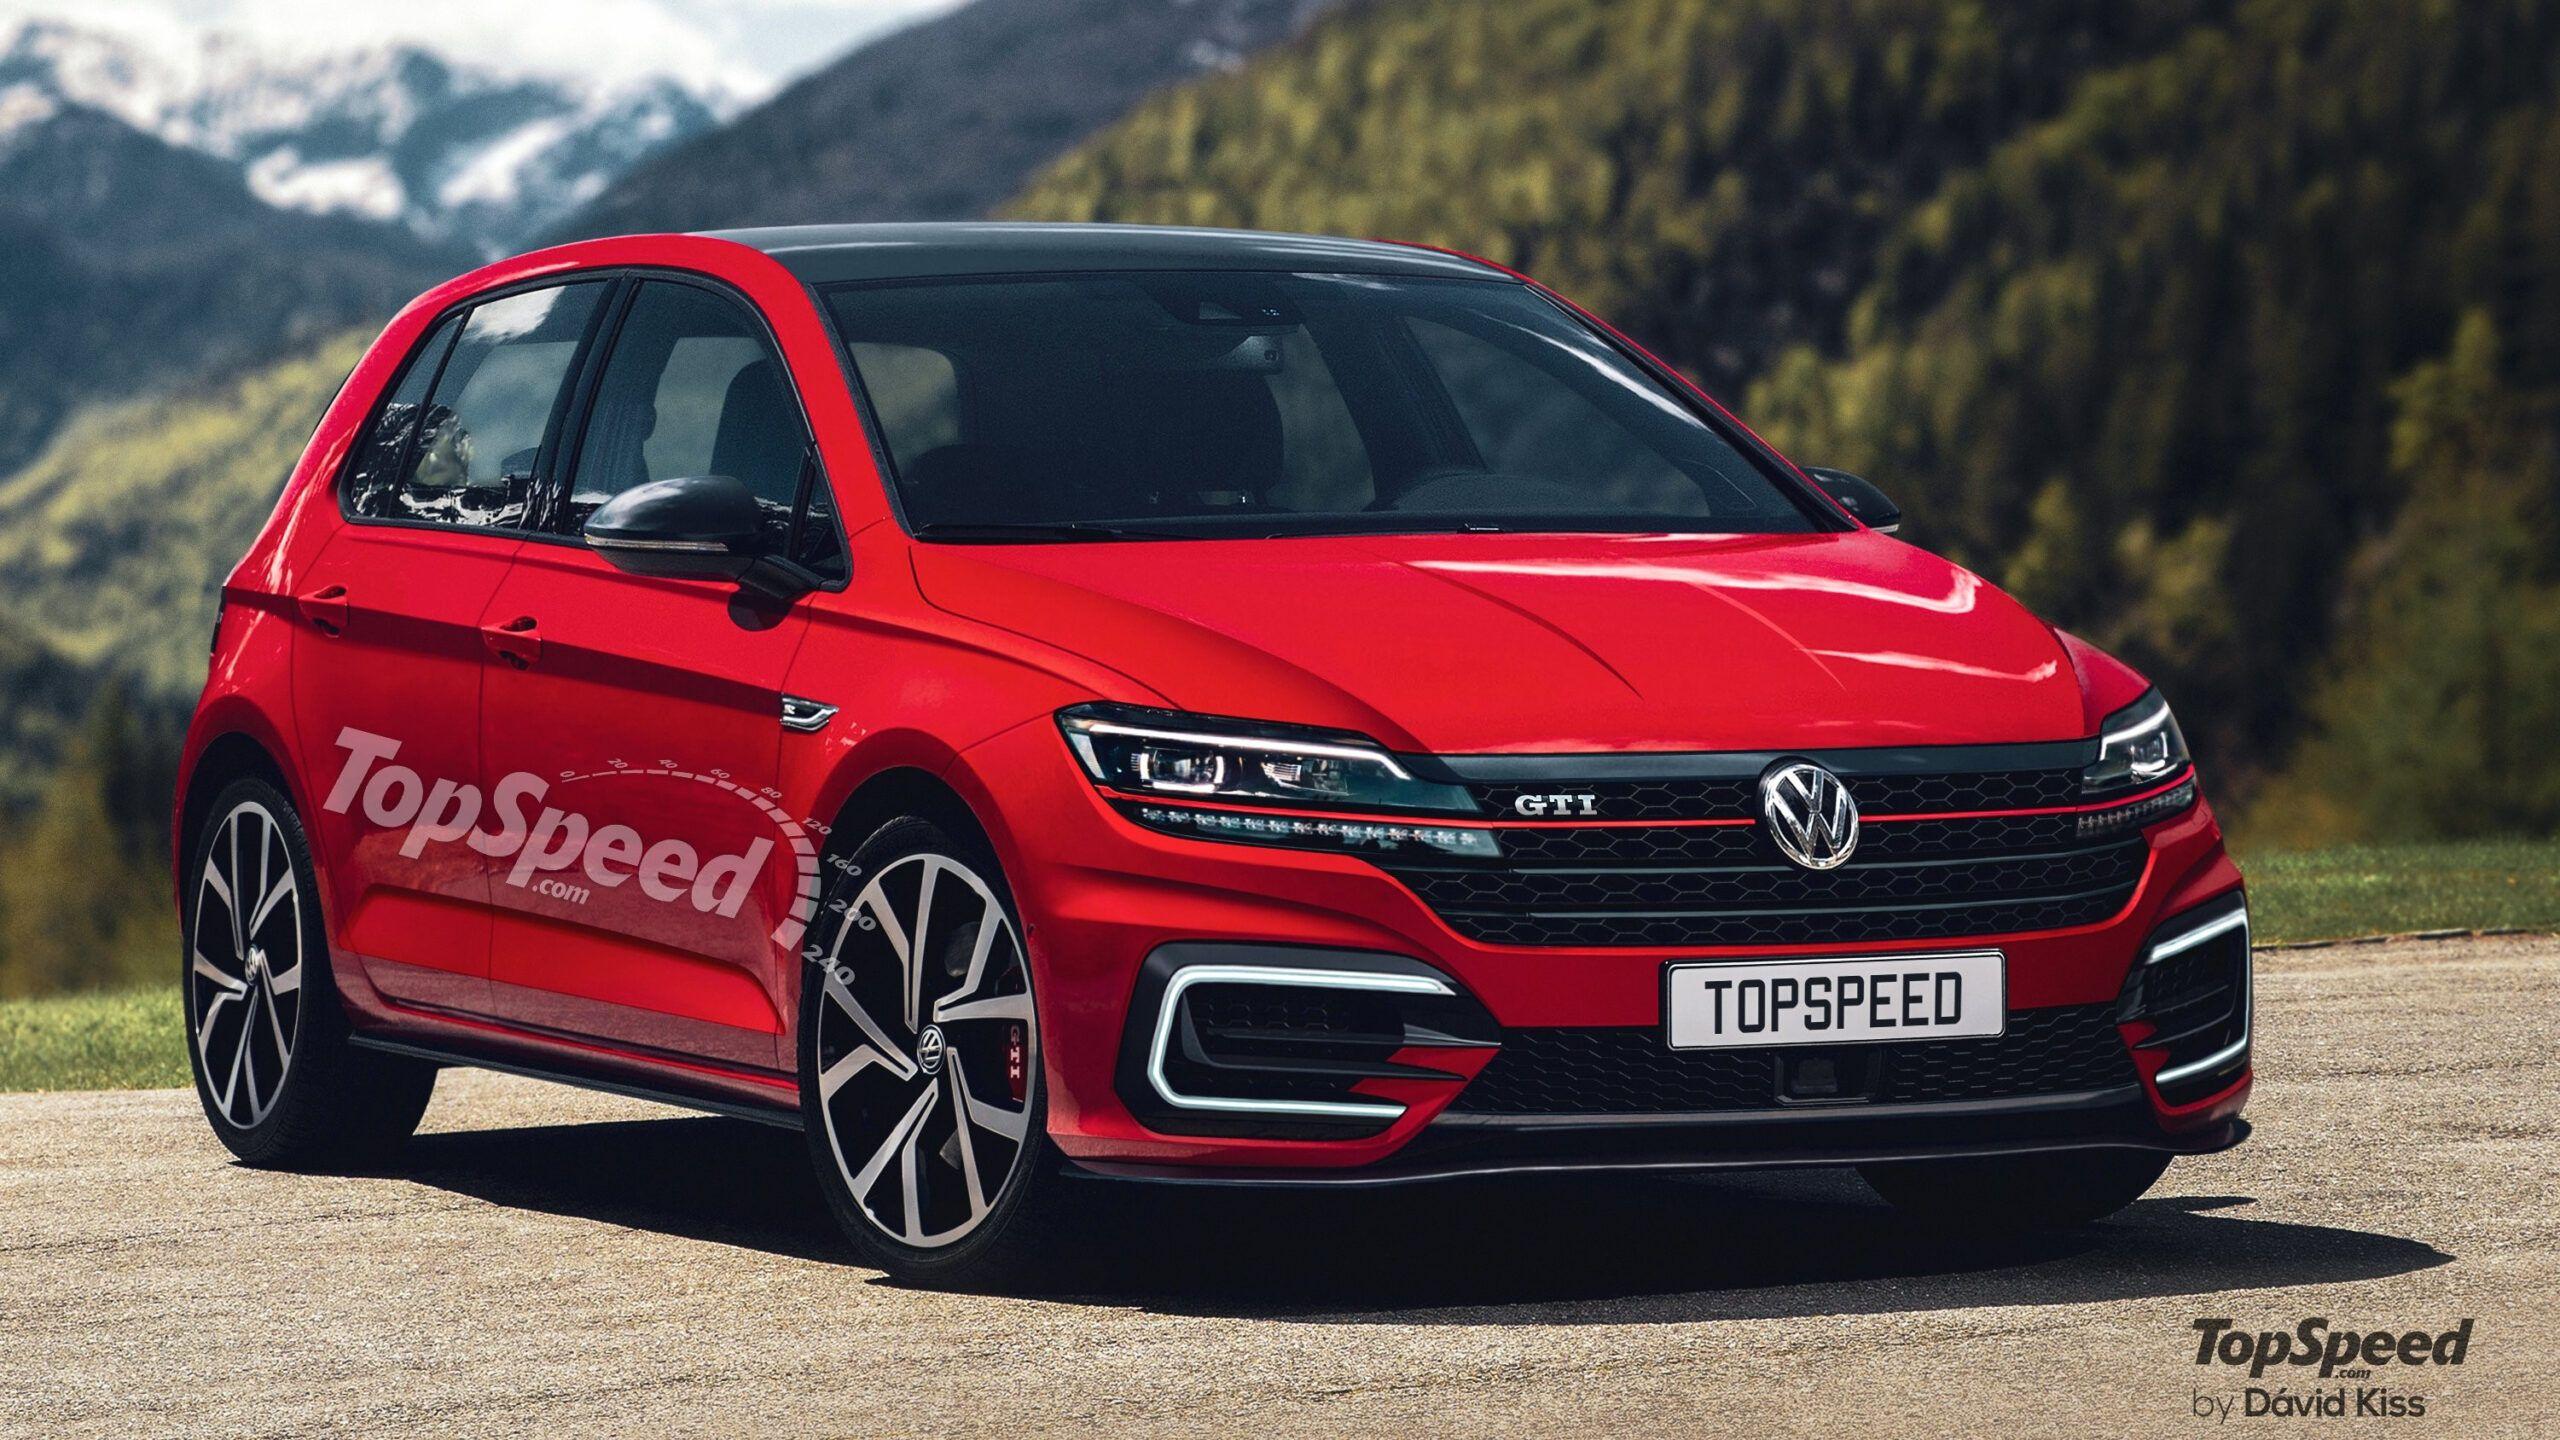 2020 Volkswagen Golf Mk8 Gti Performance Auto Carros